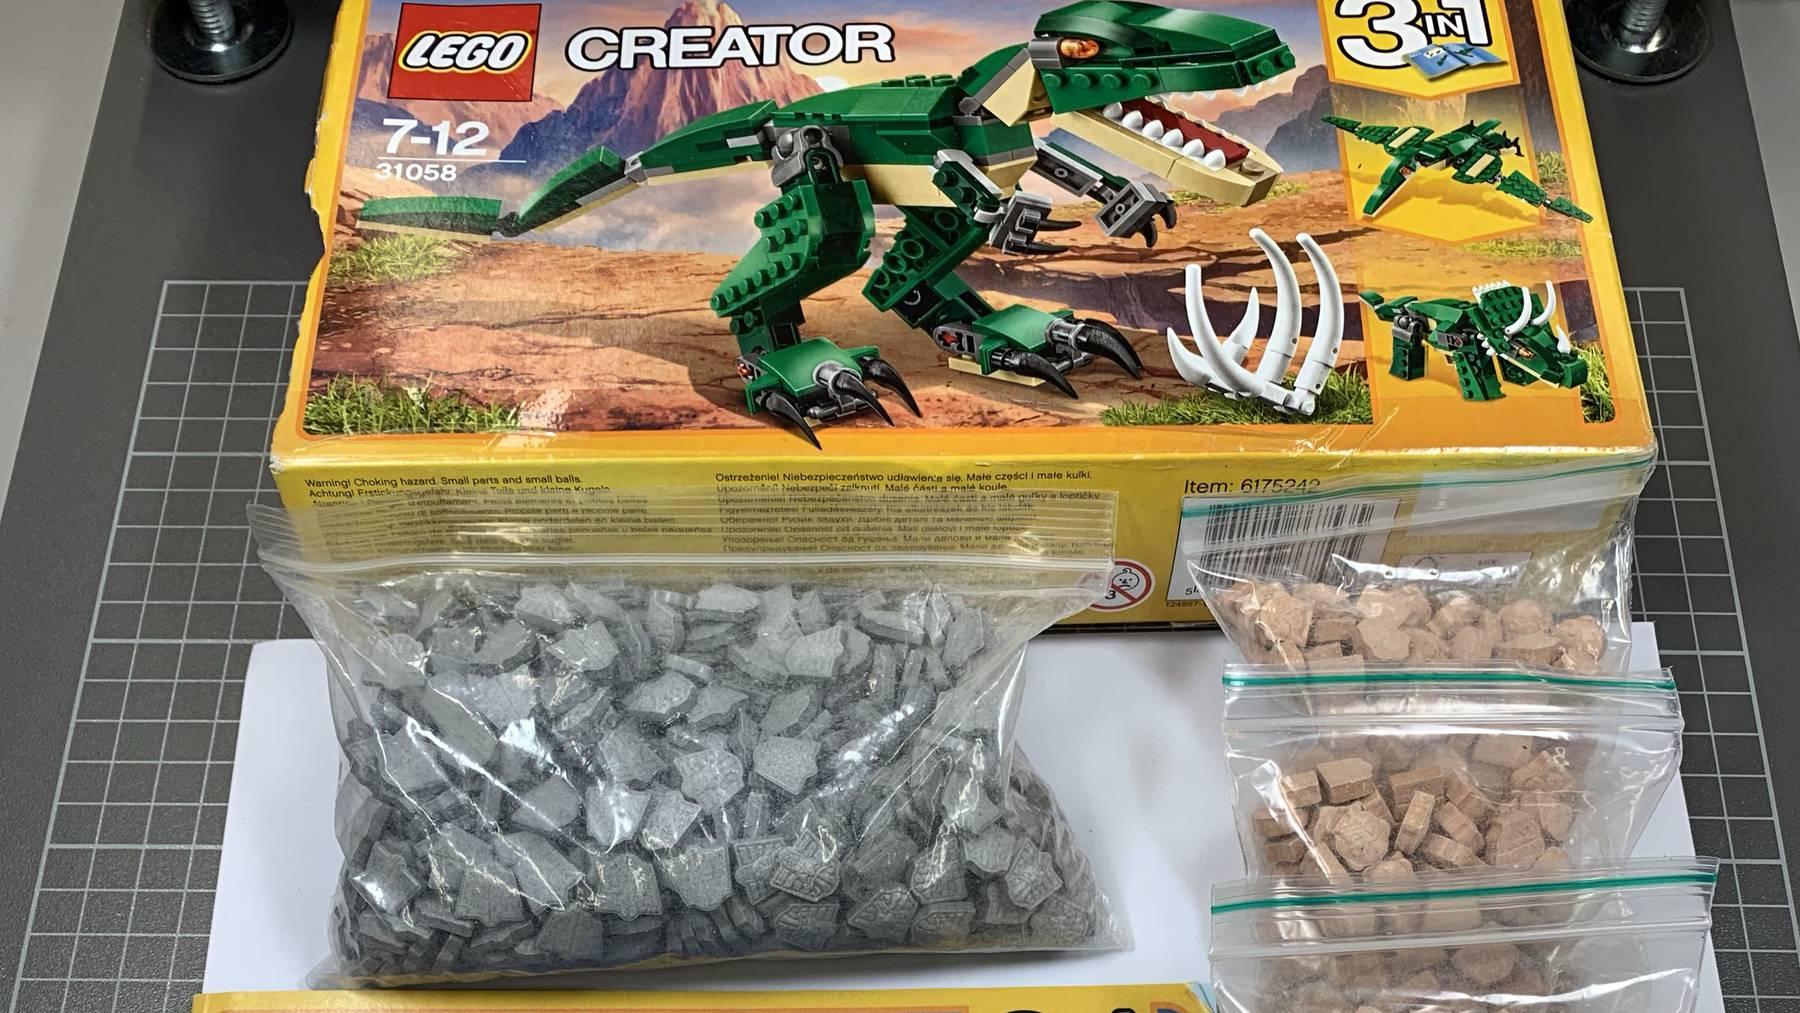 Ecstasy in Legopackung